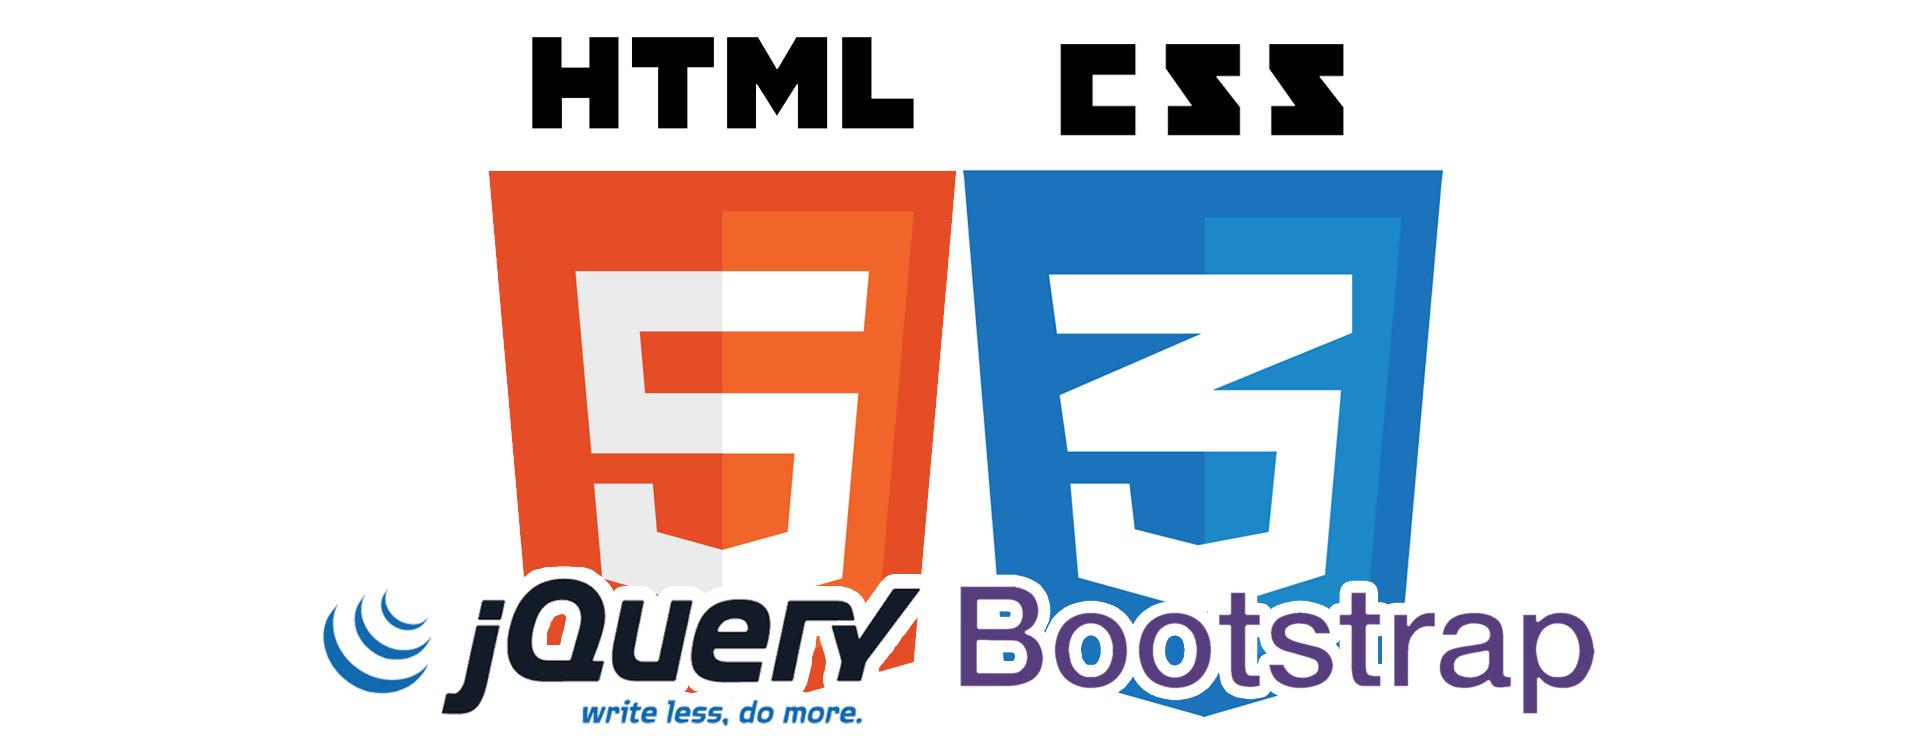 Corso-HTML5+CSS3+JQUERY+BOOTSTRAP